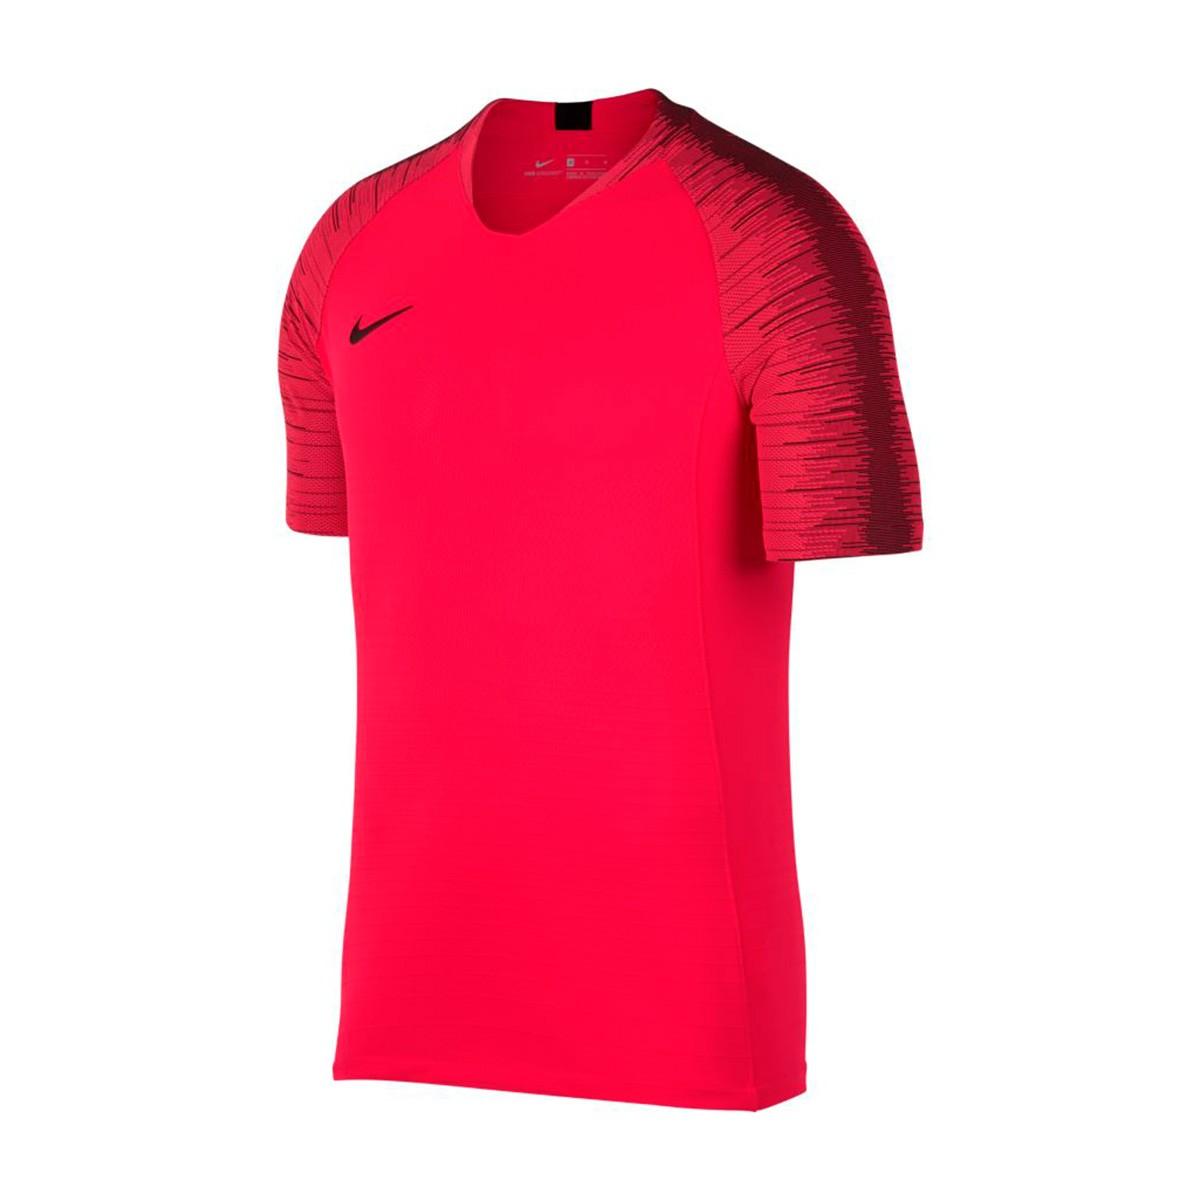 93e0098a7c1 Jersey Nike Vaporknit Strike Siren red-Black - Football store Fútbol Emotion